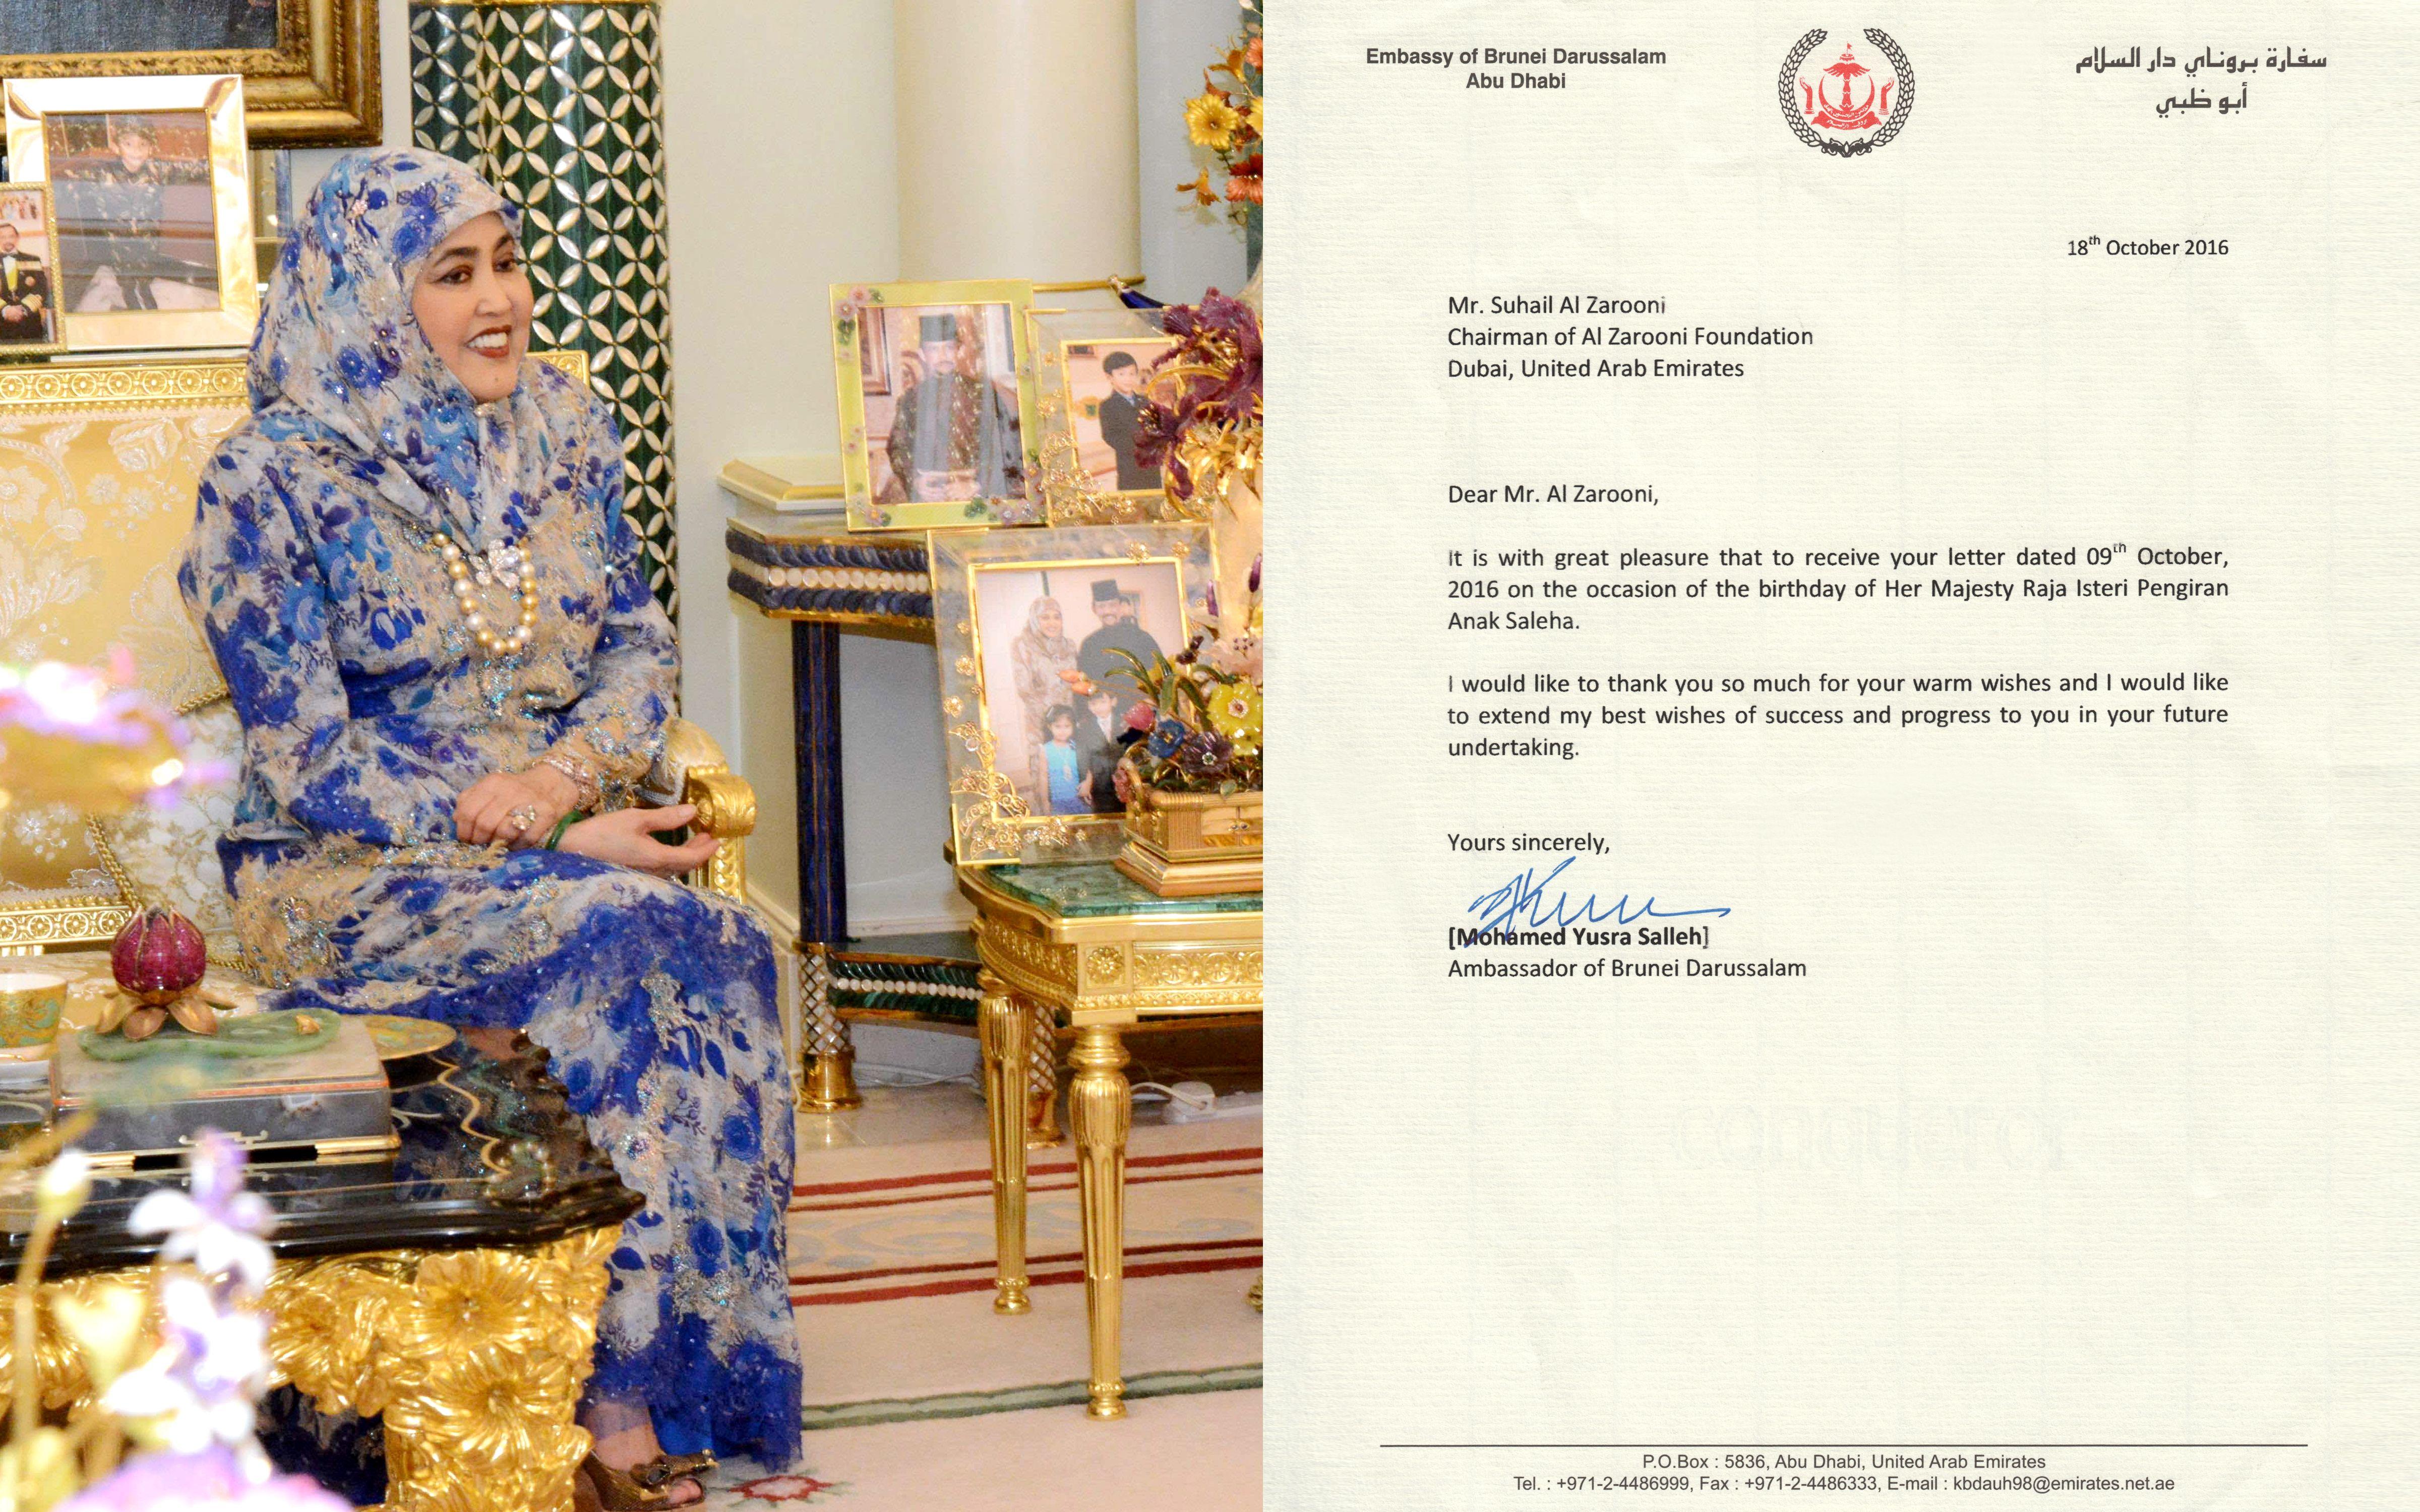 Pin By Suhail Al Zarooni On Appreciation Accrediation Majesty Appreciation Foundation